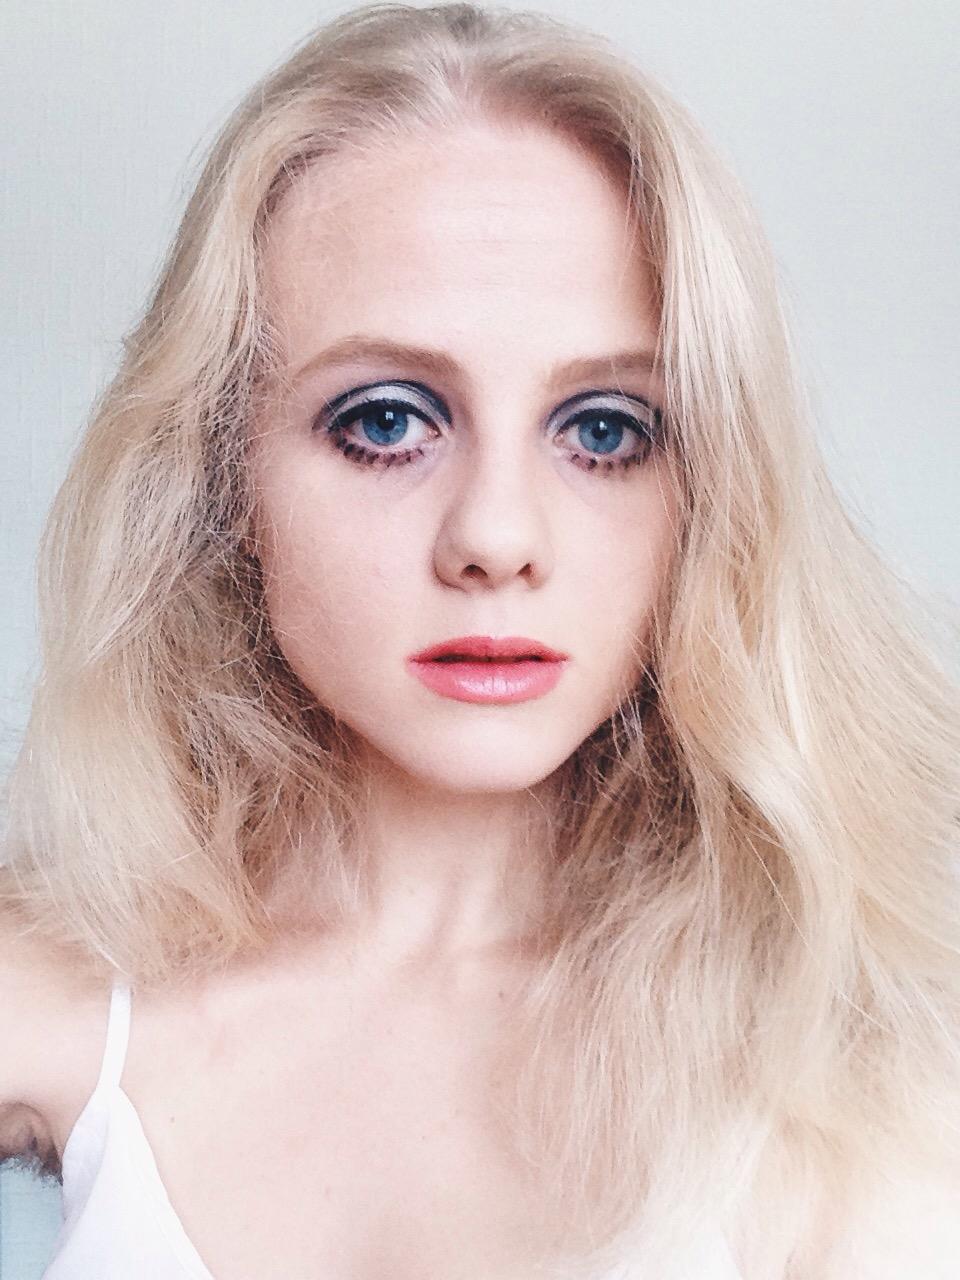 70s Makeup Hello Friend It S Me Katya